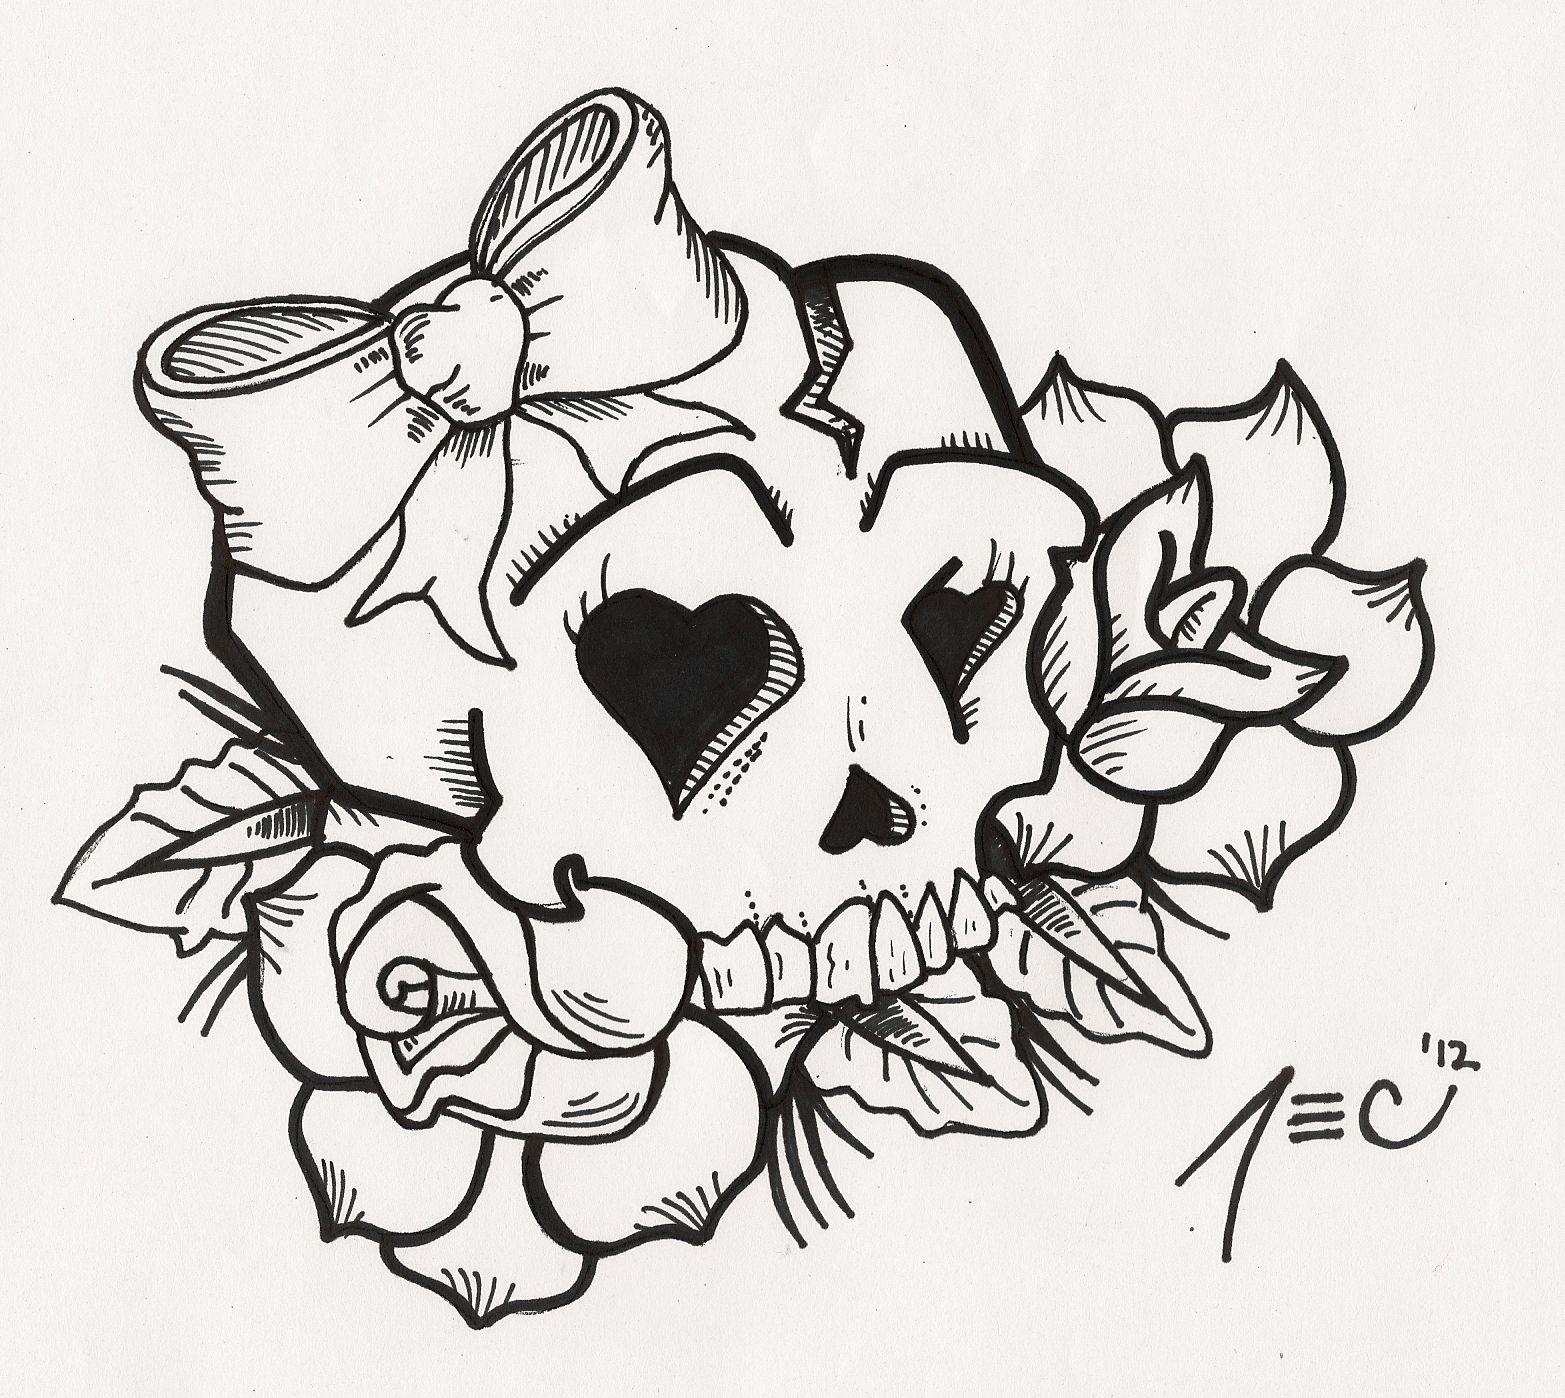 Girly Skull Tattoo by theADROCK on deviantART Girly